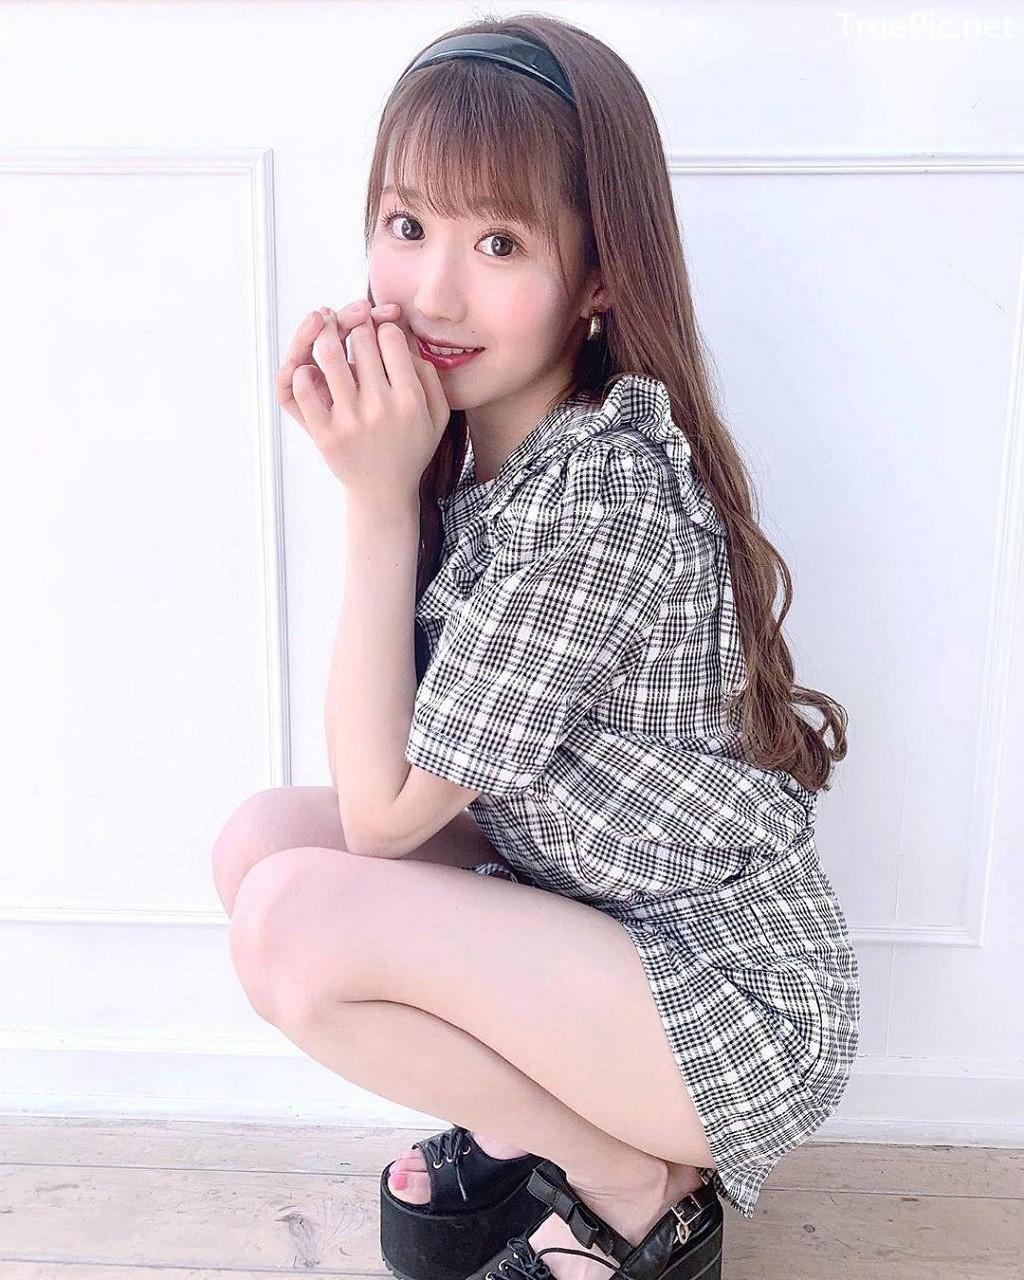 Image Japanese Singer And Idol - Otani Emiri - [Young Animal] 2019 No.13 - TruePic.net - Picture-9